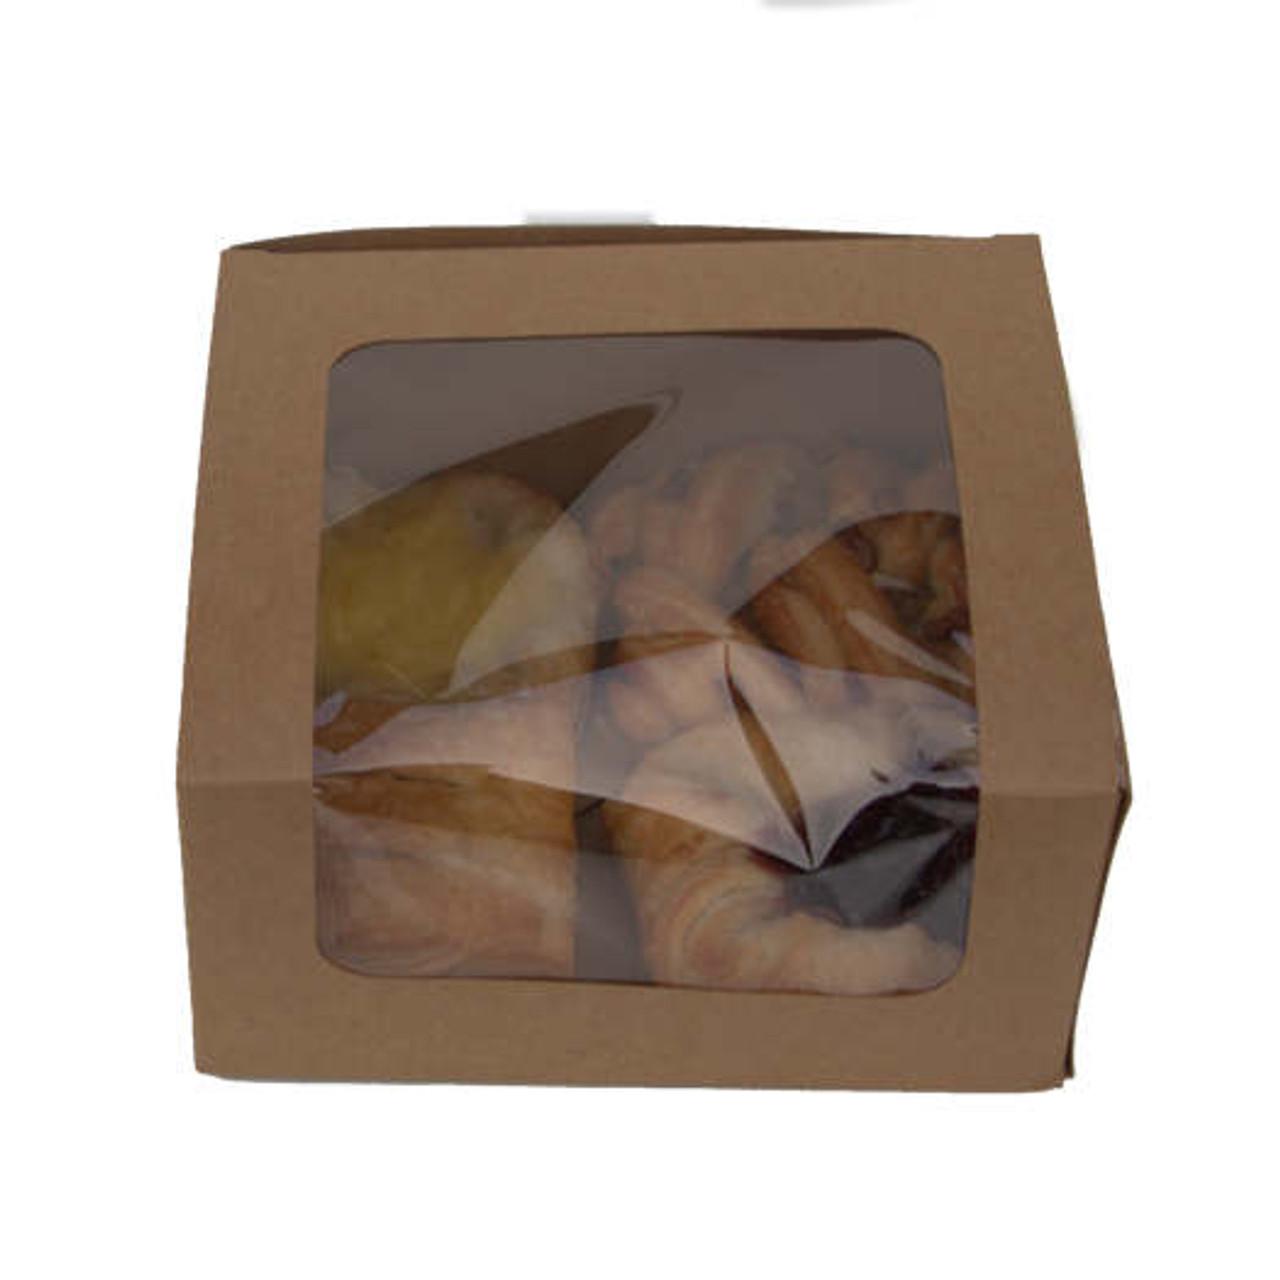 Pack x 50 Cardboard kraft Window Bakery Box 140x 125 x 72mm Size 1